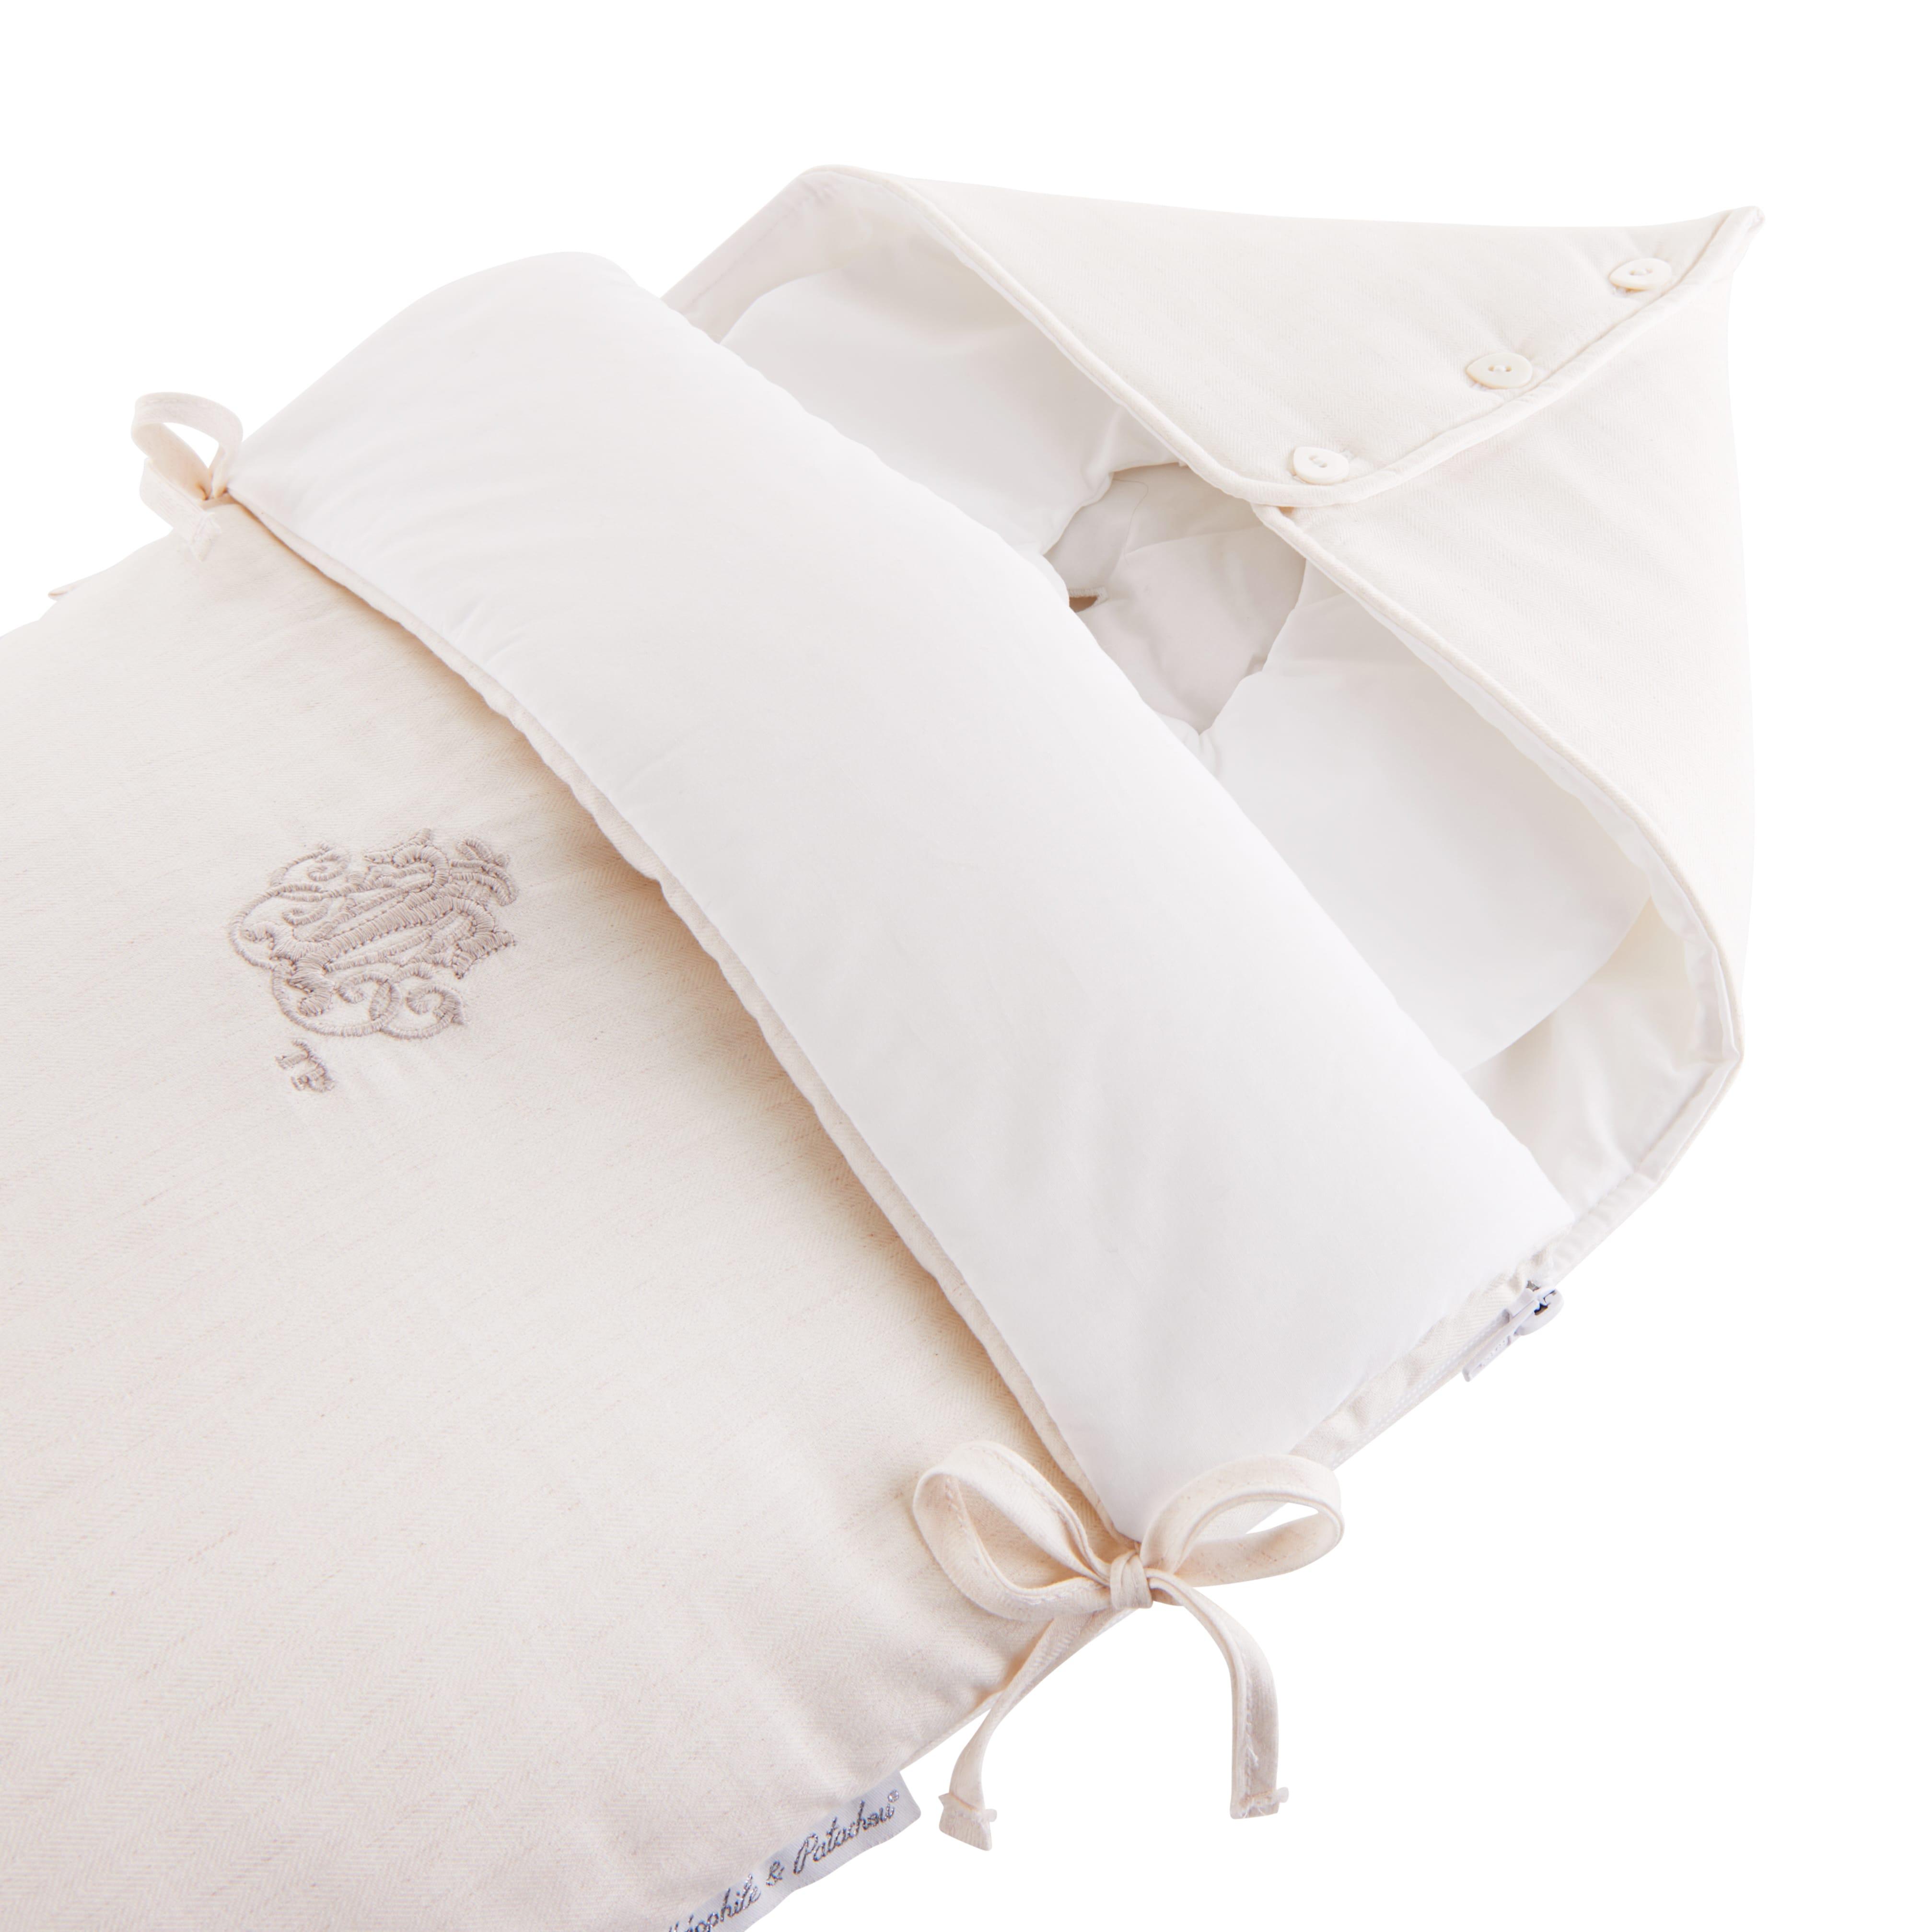 kathmandu sleeping bag washing instructions